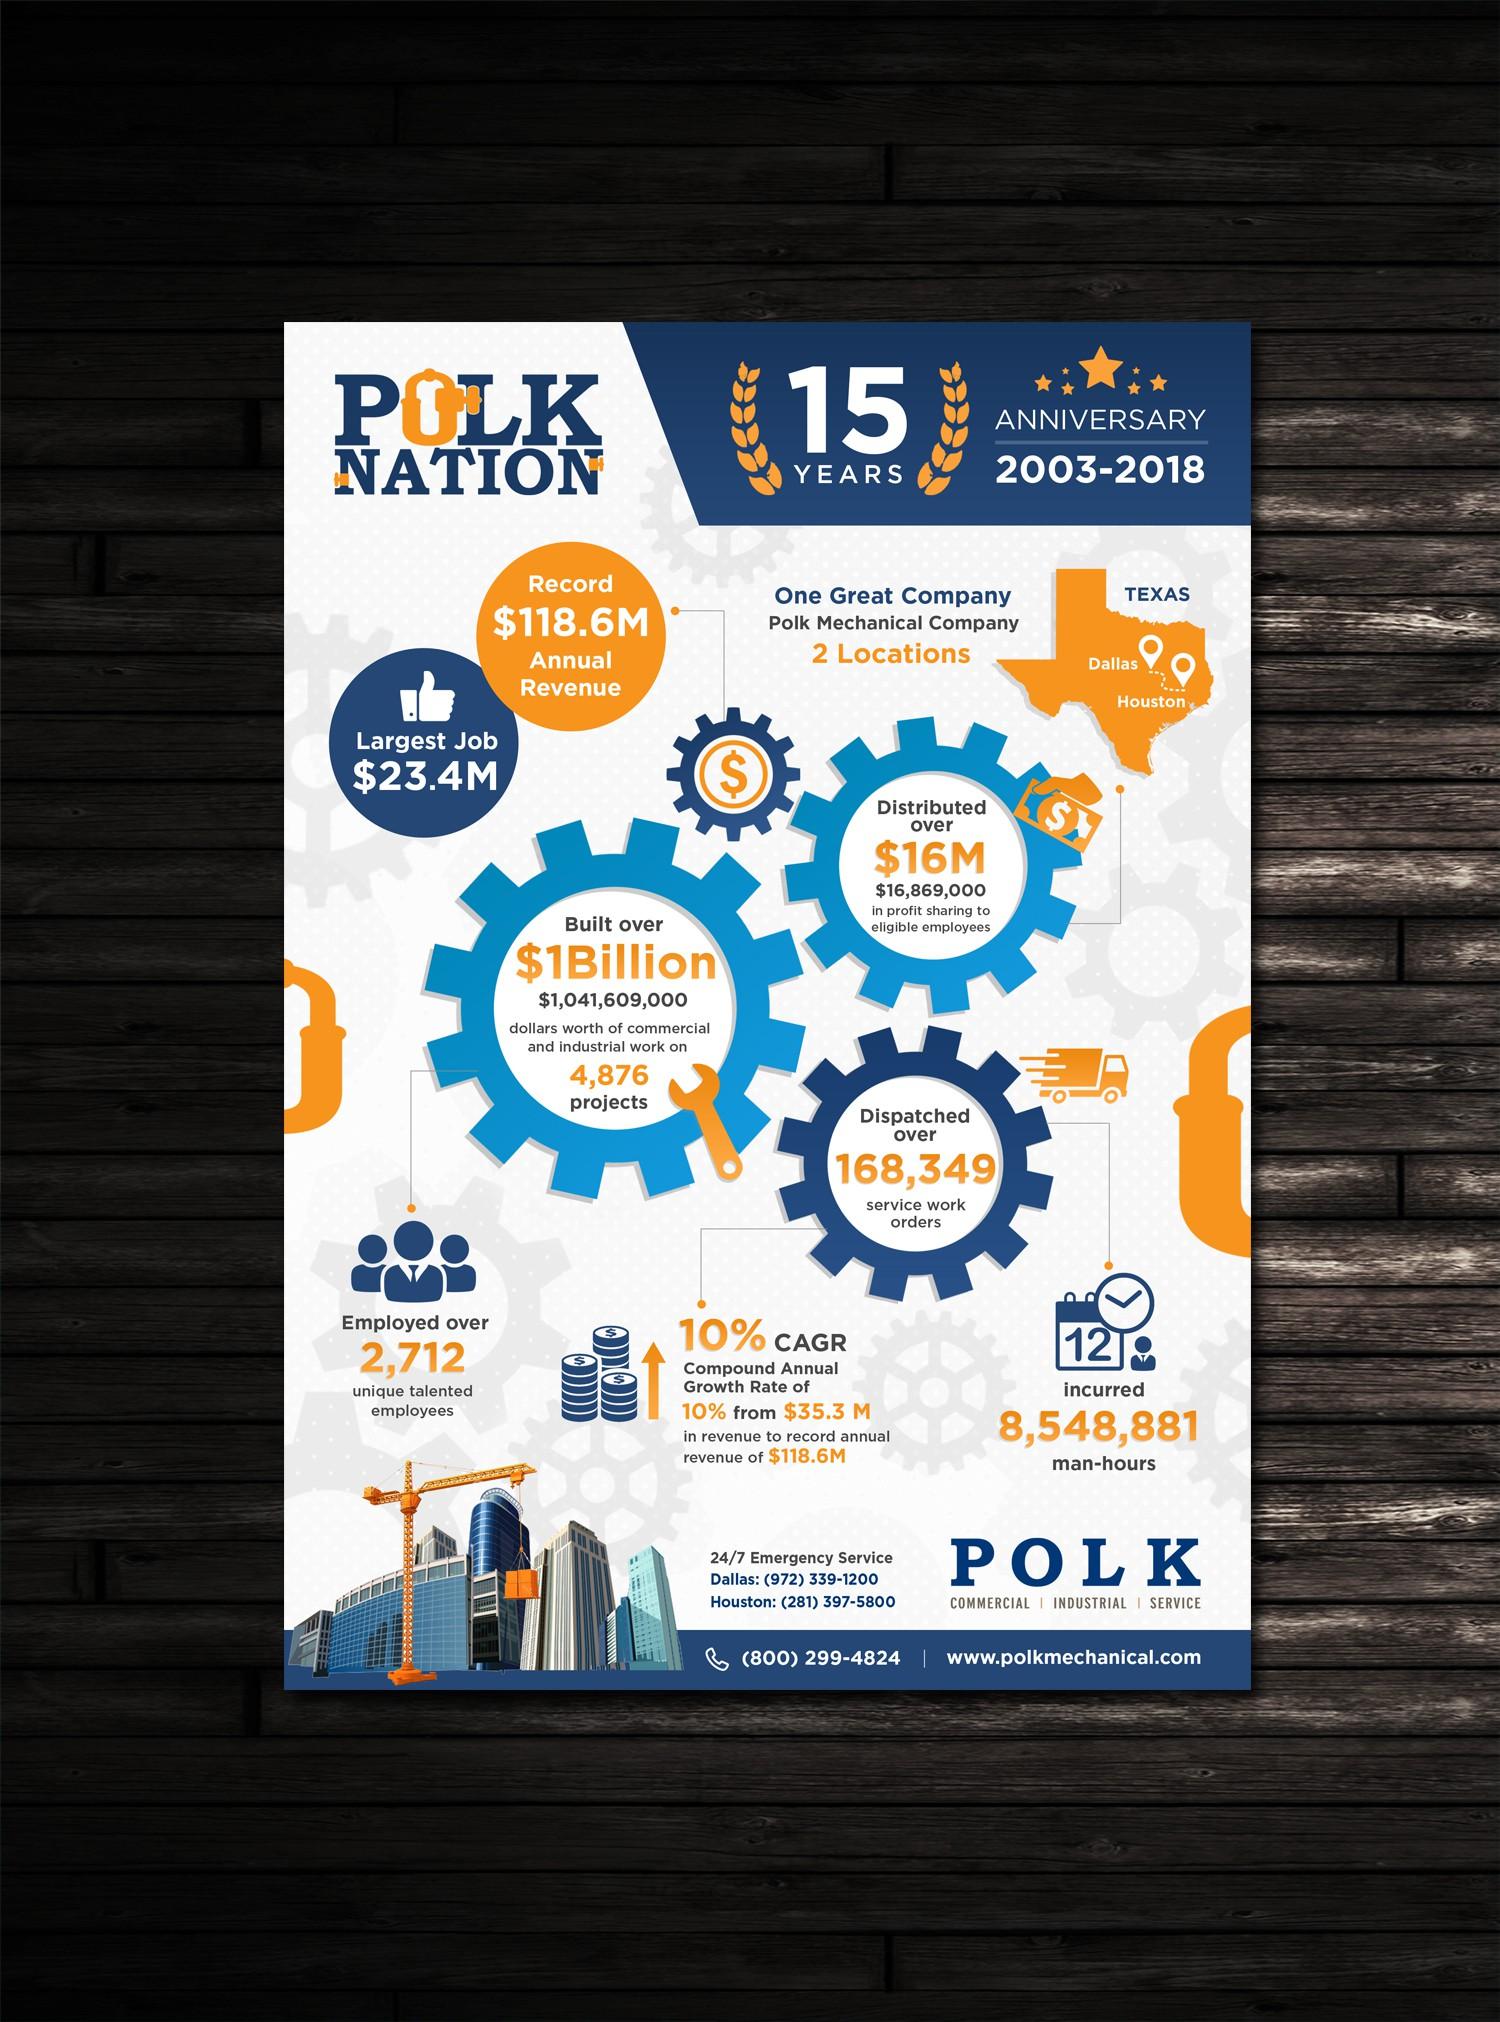 Polk Mechanical 15yr Anniversary